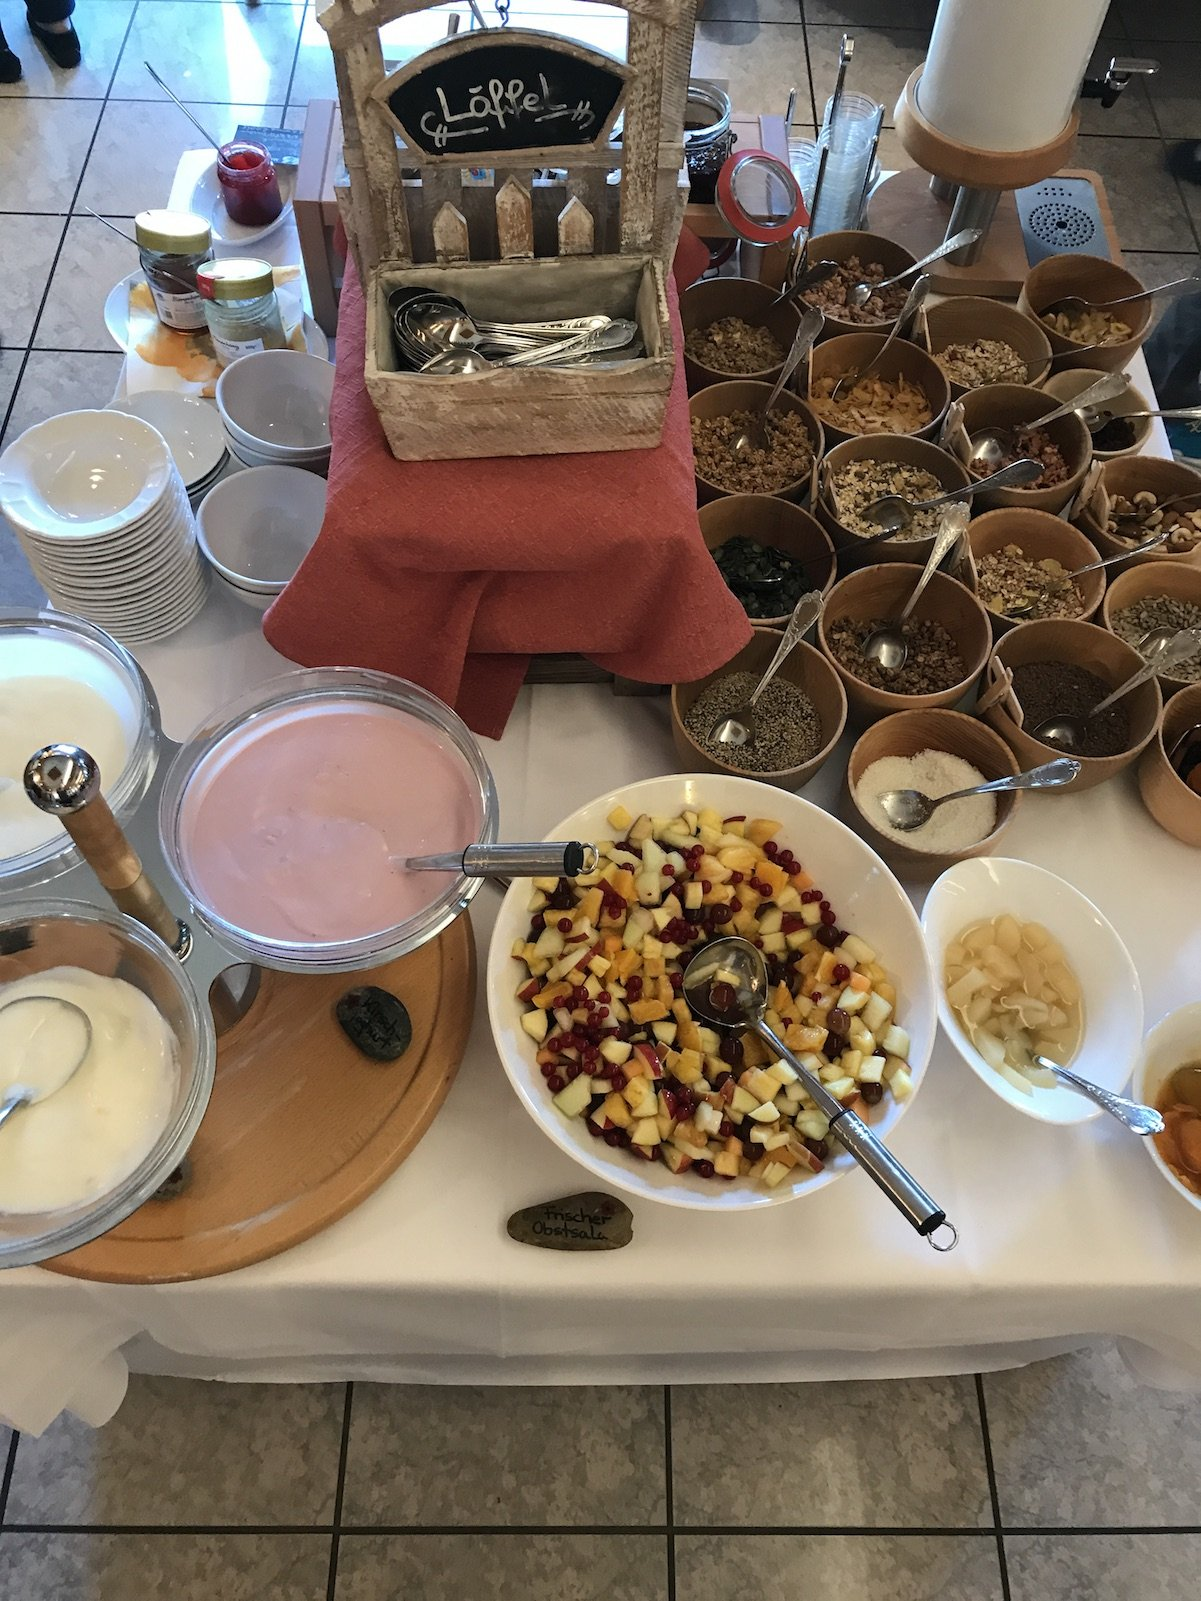 Jogurt und Co. zum Frühstück